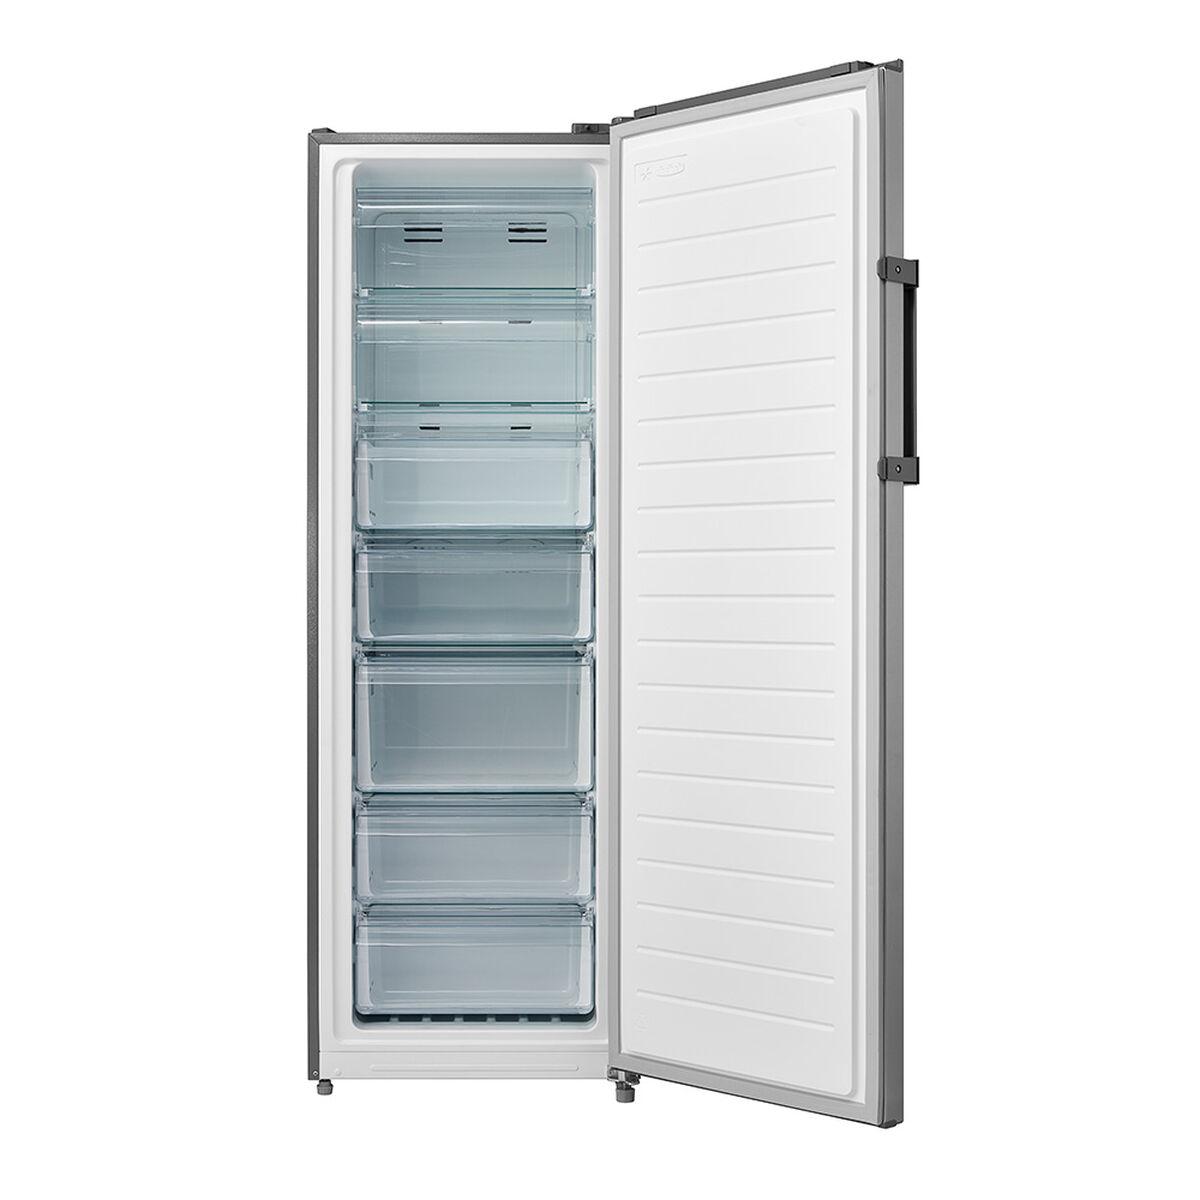 Freezer Vertical Midea MFV-2400S32FW 227 lts